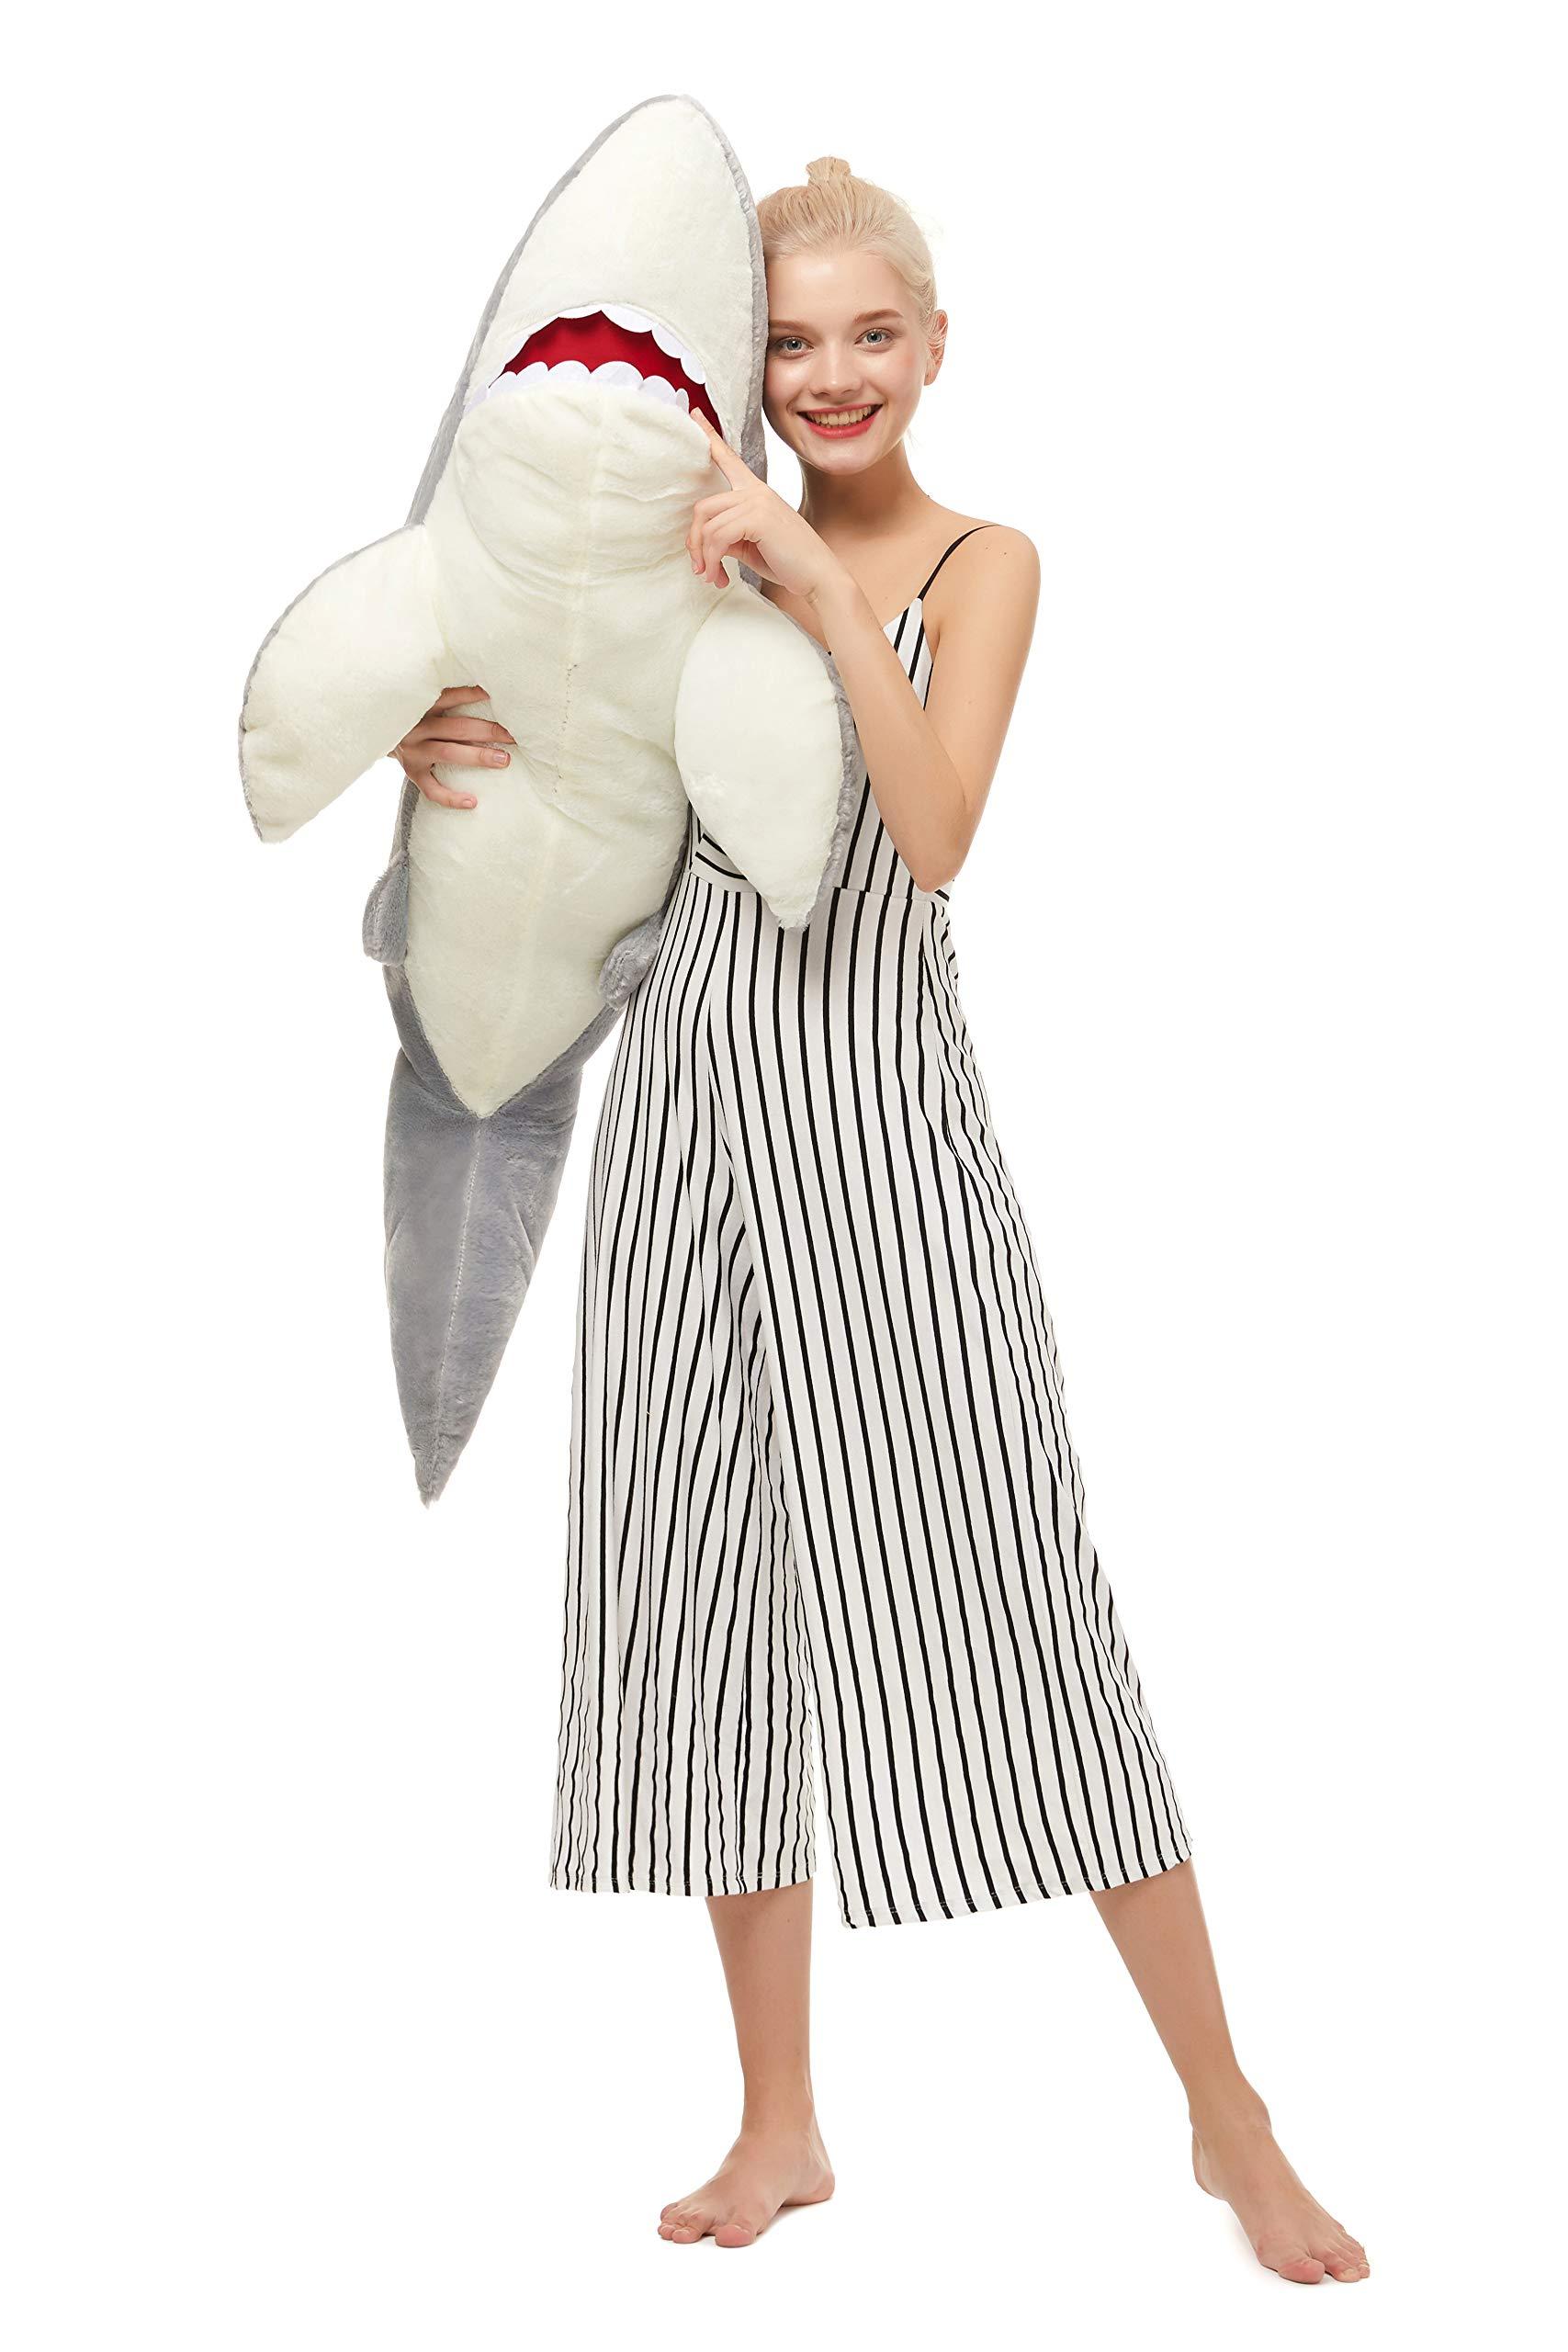 MorisMos Giant Shark Stuffed Animal,Gray Shark Plush Pillow,Plush Toy,Gift for Kids Girlfriend,51 Inches by MorisMos (Image #5)